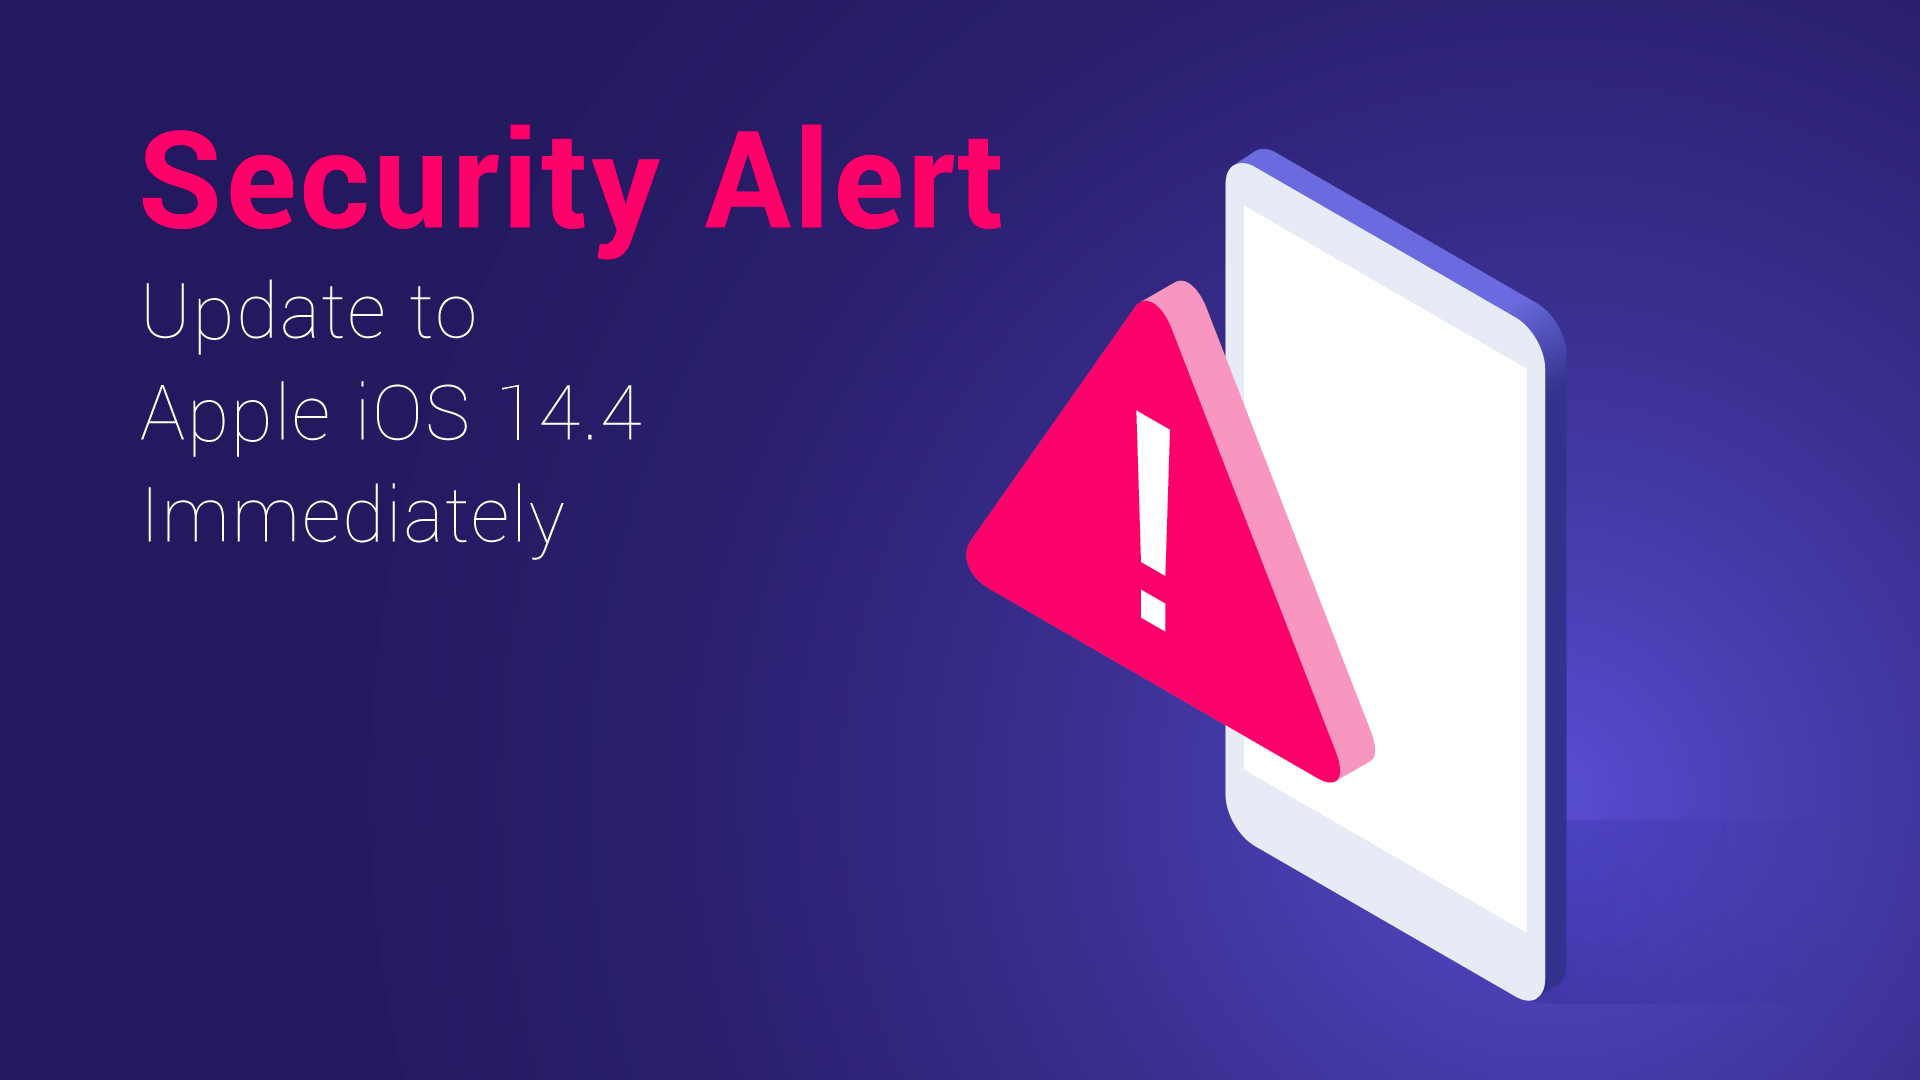 Update Apple iOS Immediately - Security Alert